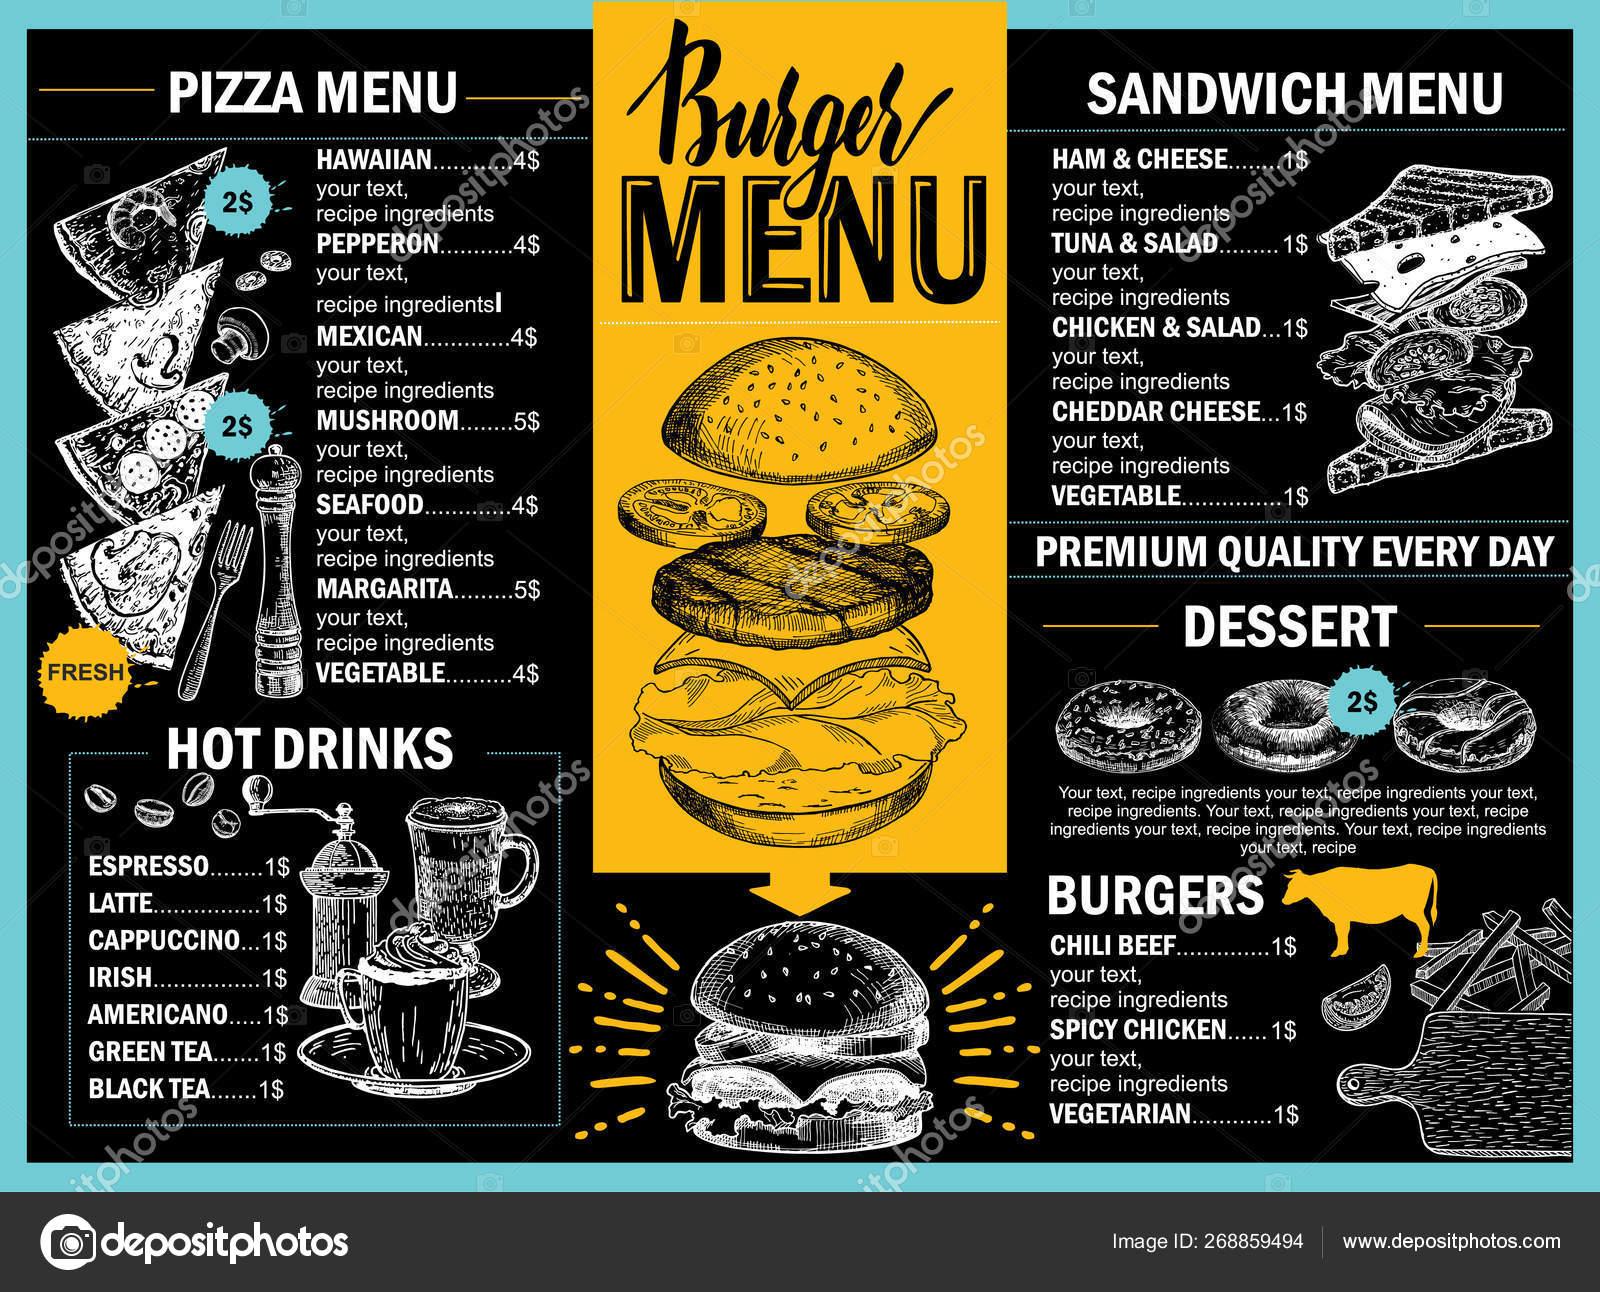 Food Menu Restaurant Cafe Design Template Hand Drawn Graphic Elements Stock Vector C Luisvv 268859494